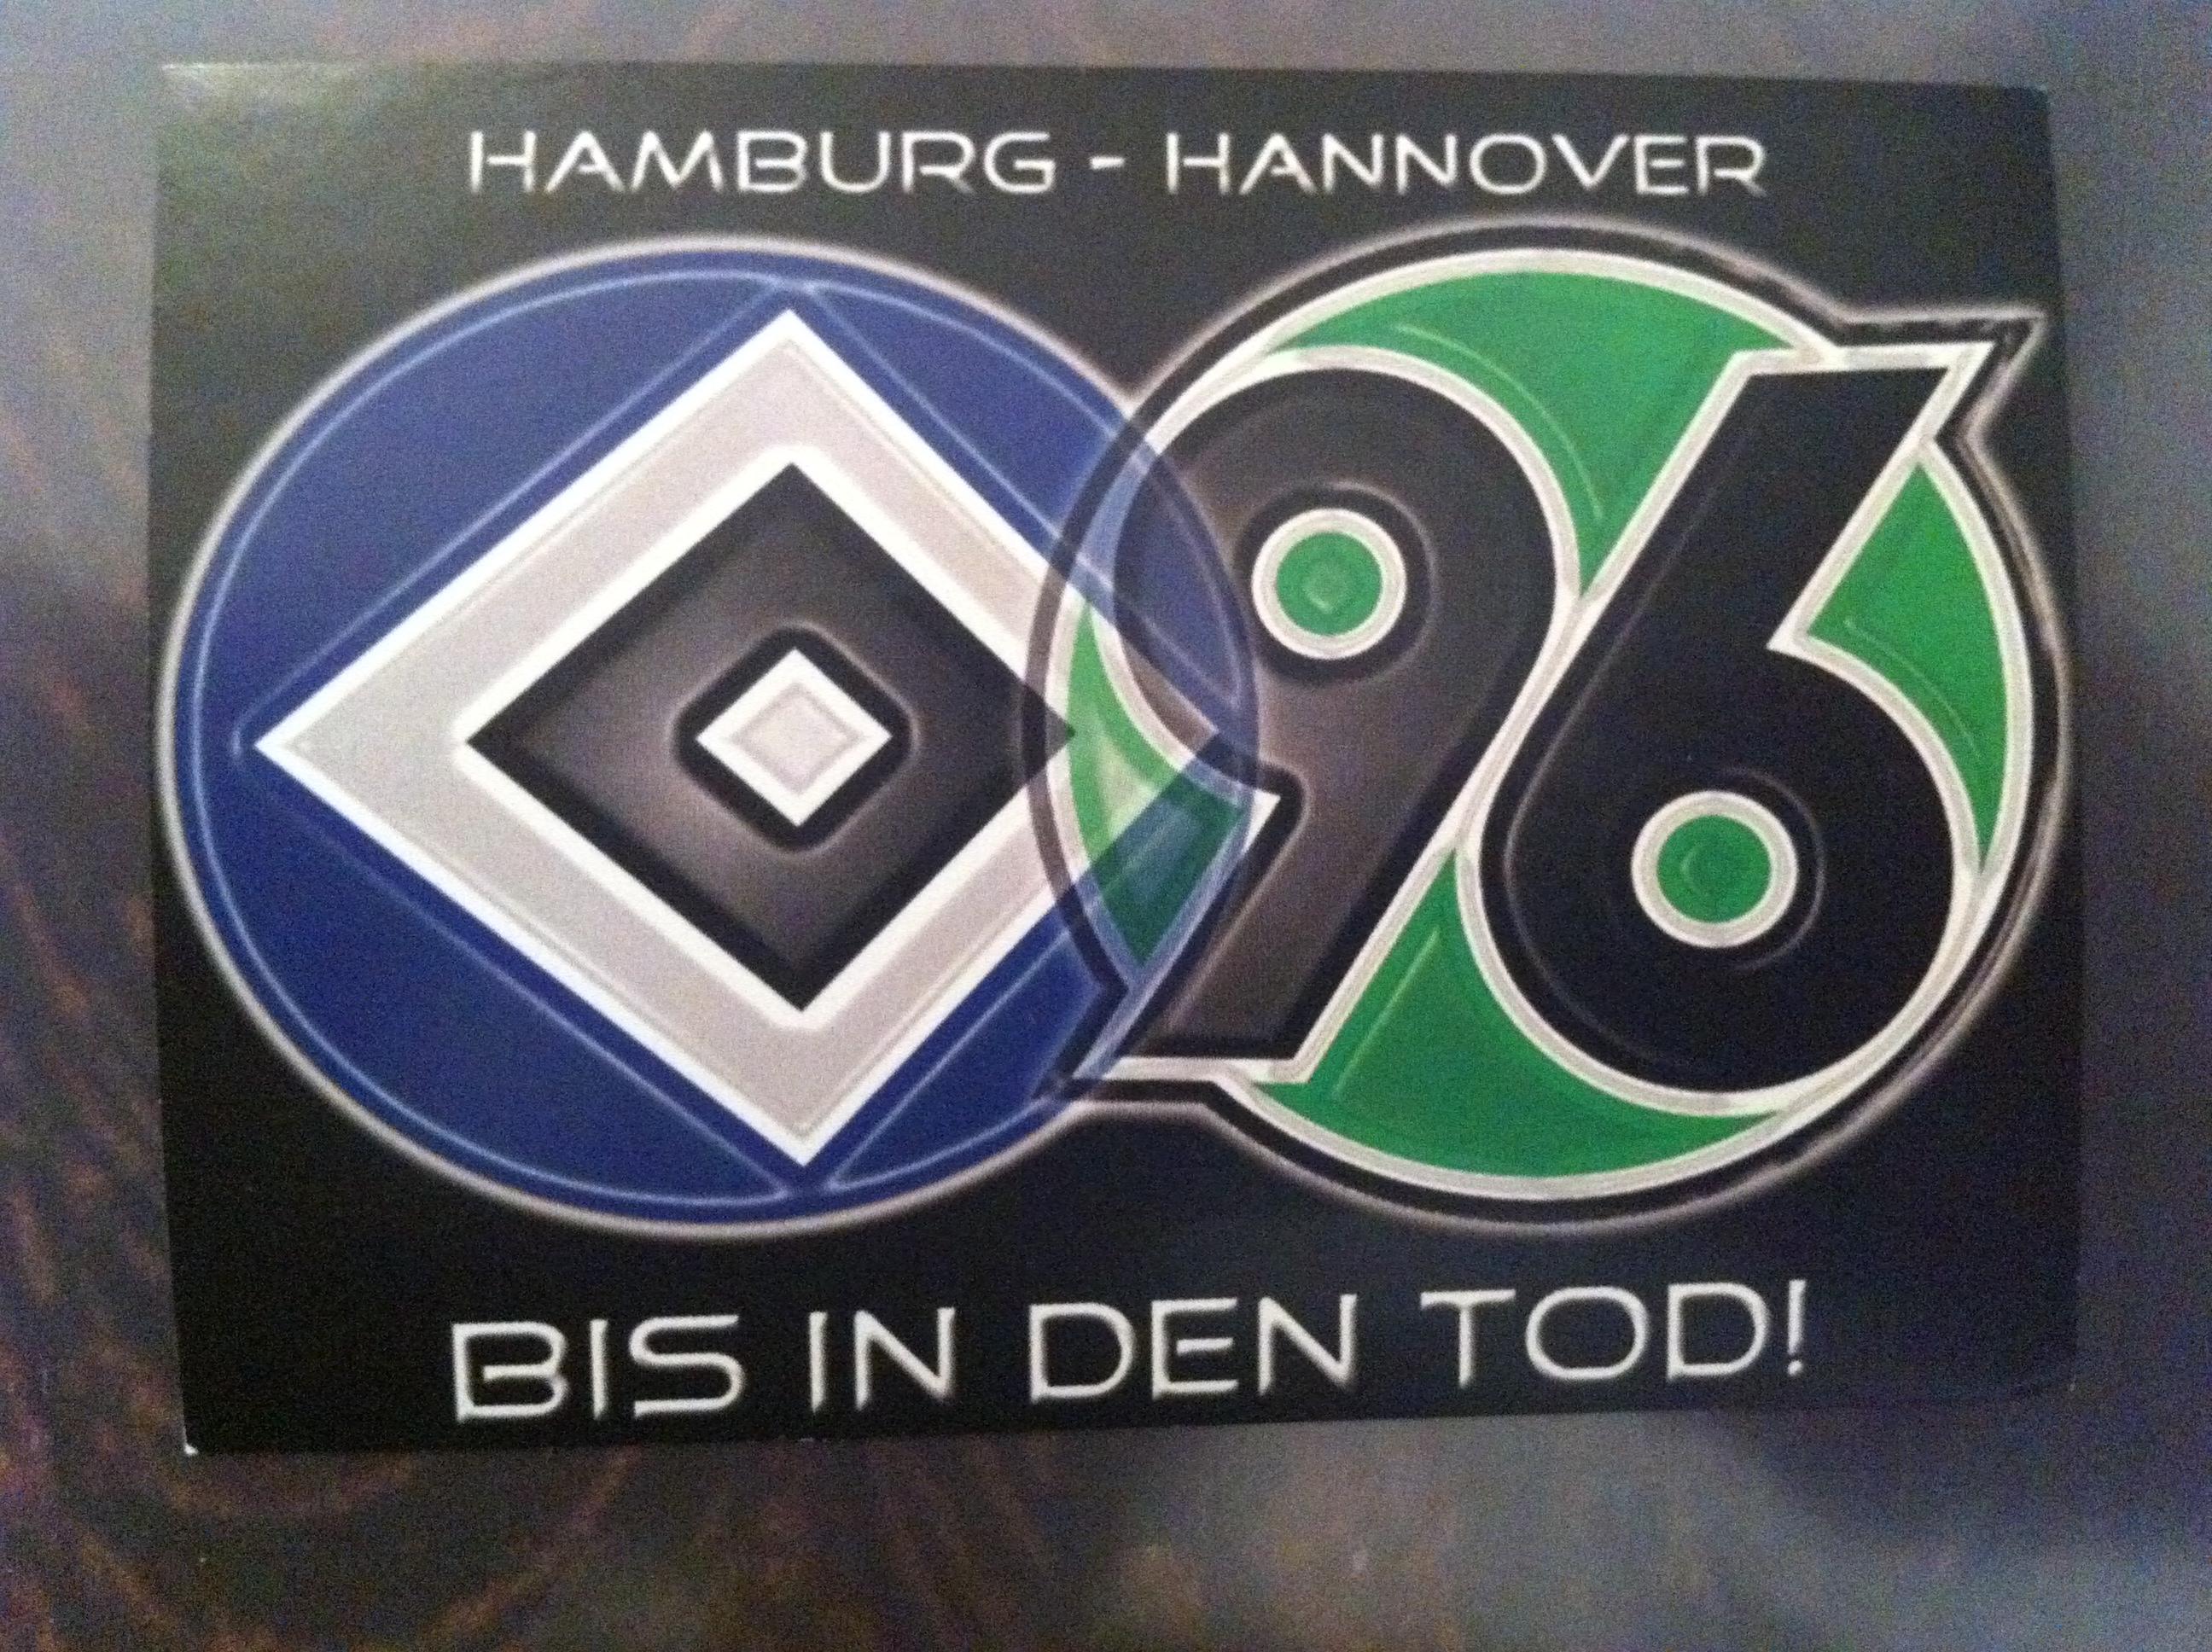 hamburg hannover: